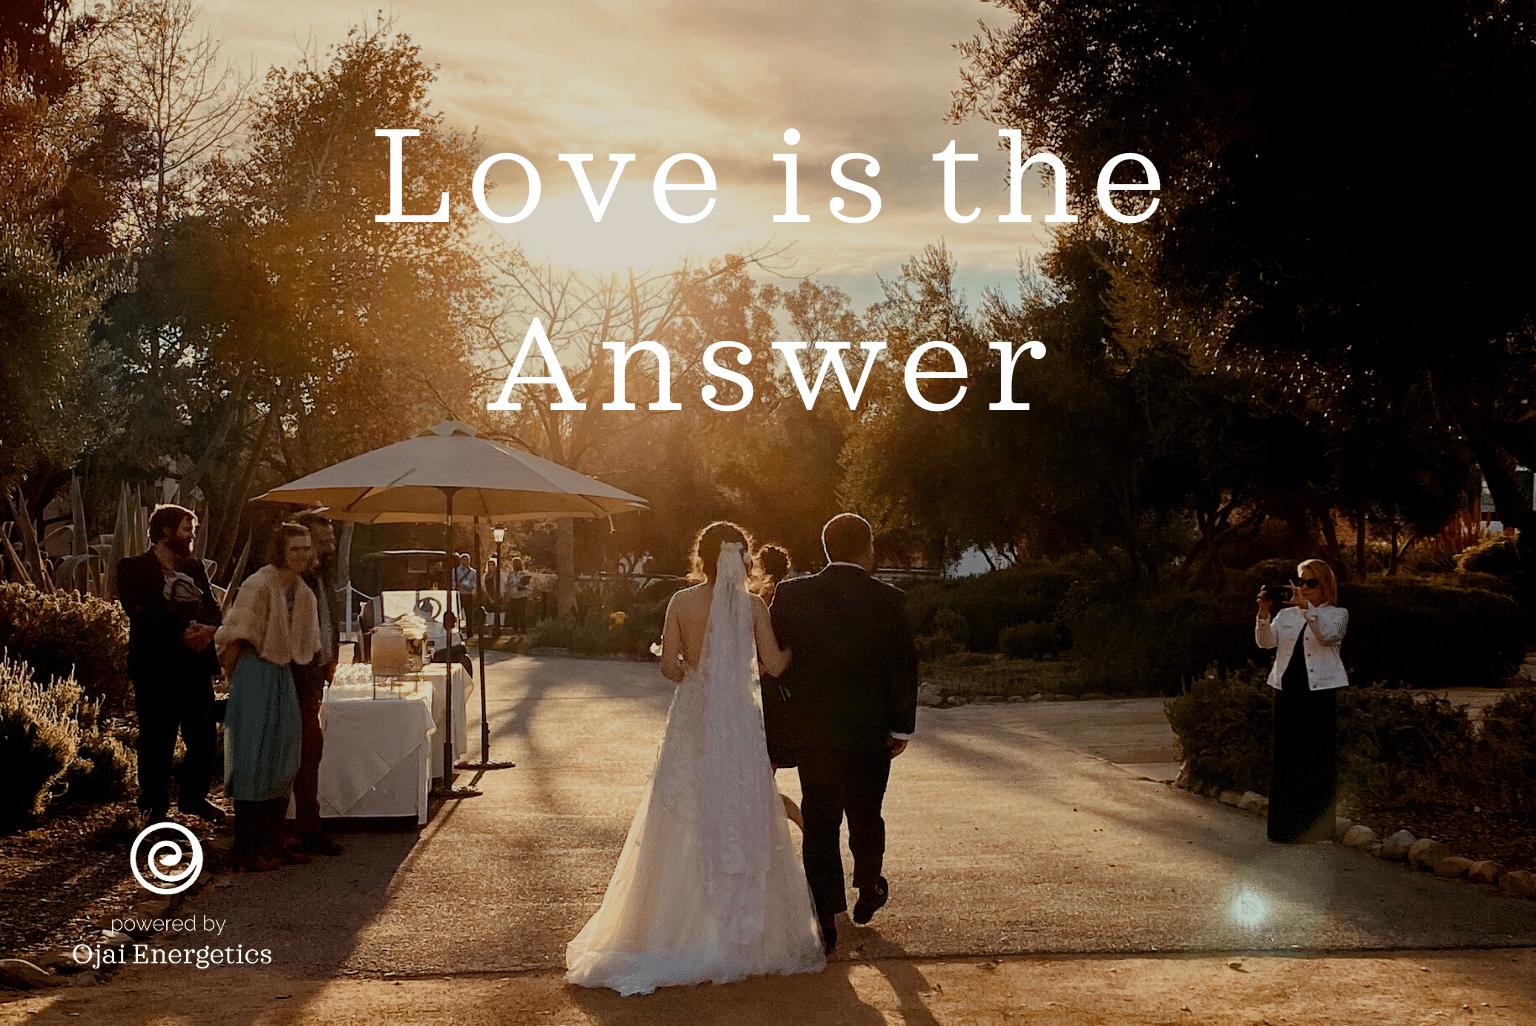 Will Kleidon's Manifesto: Love Is The Answer